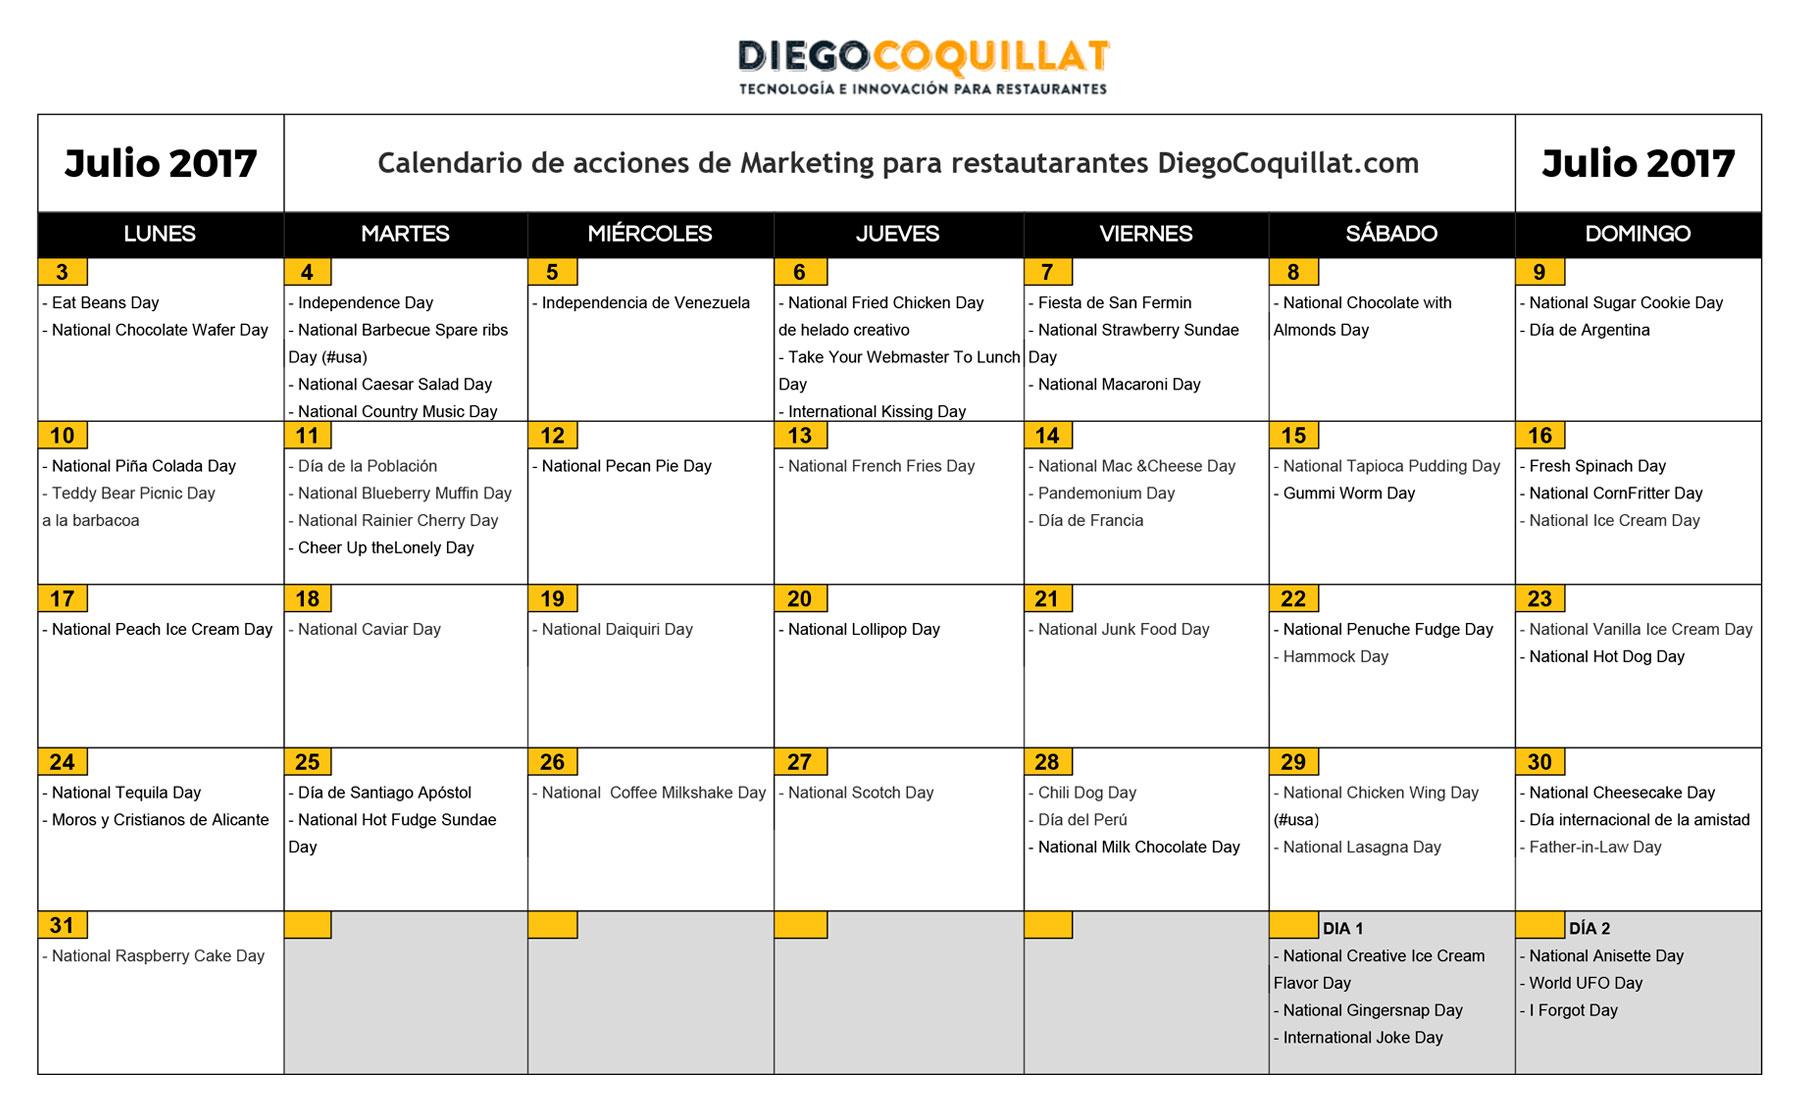 July 2017: marketing activities calendar for restaurants